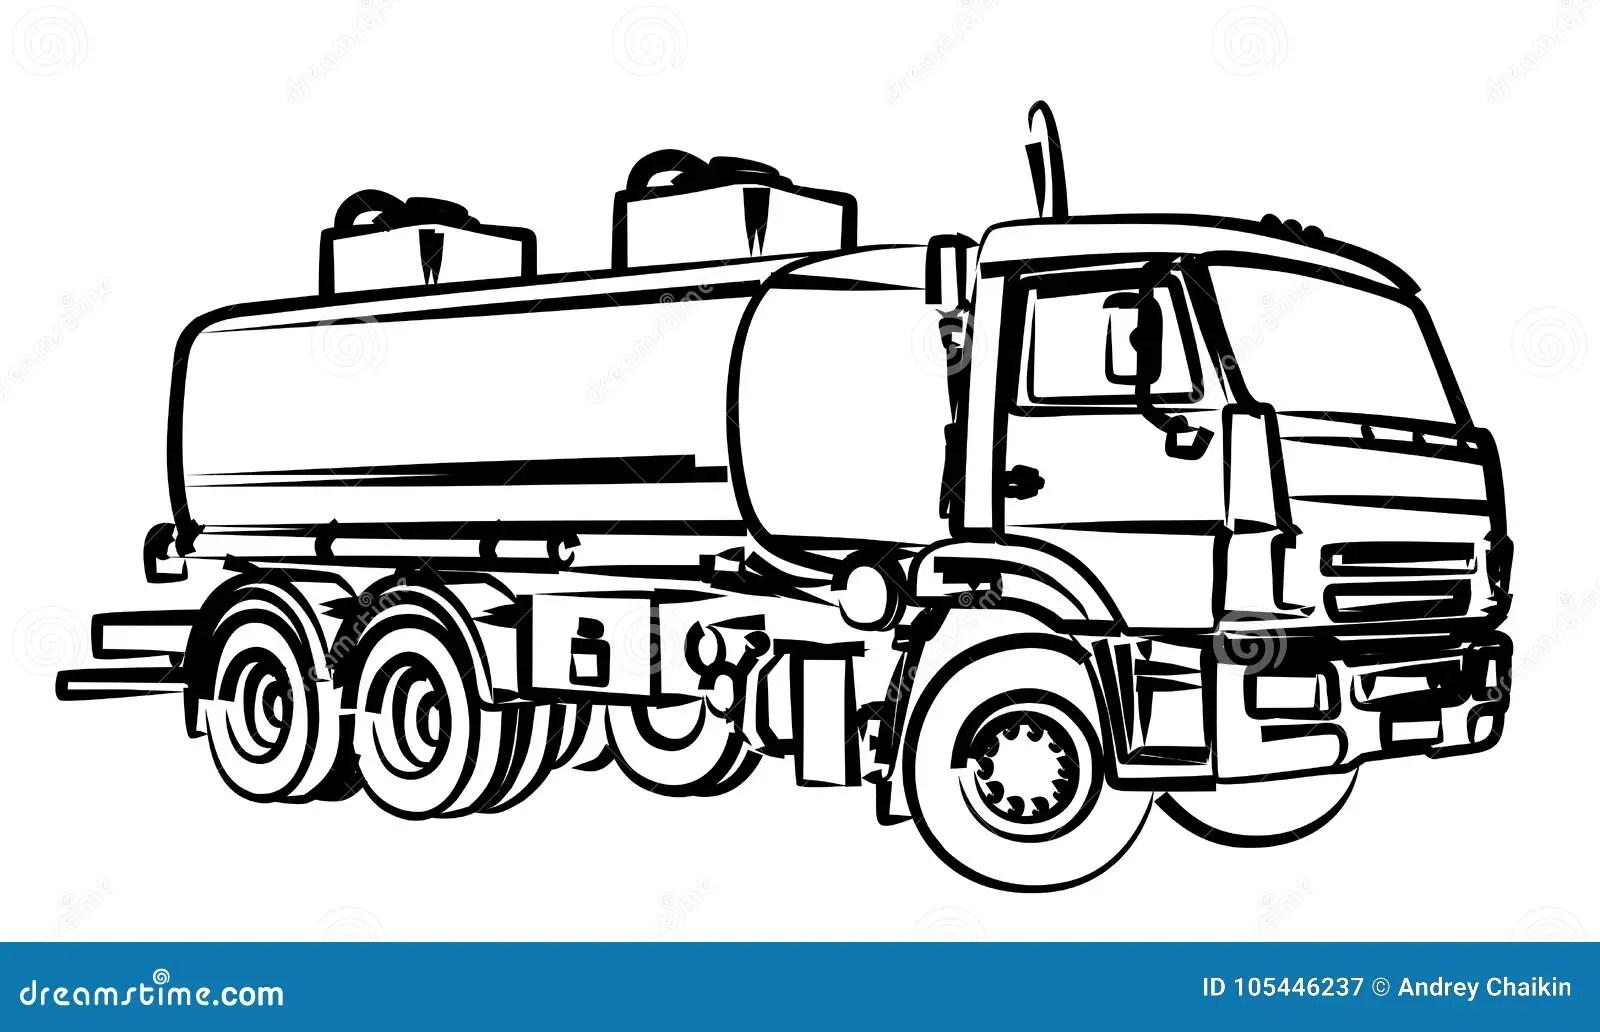 Fuel Truck Sketch Stock Vector Illustration Of Industry